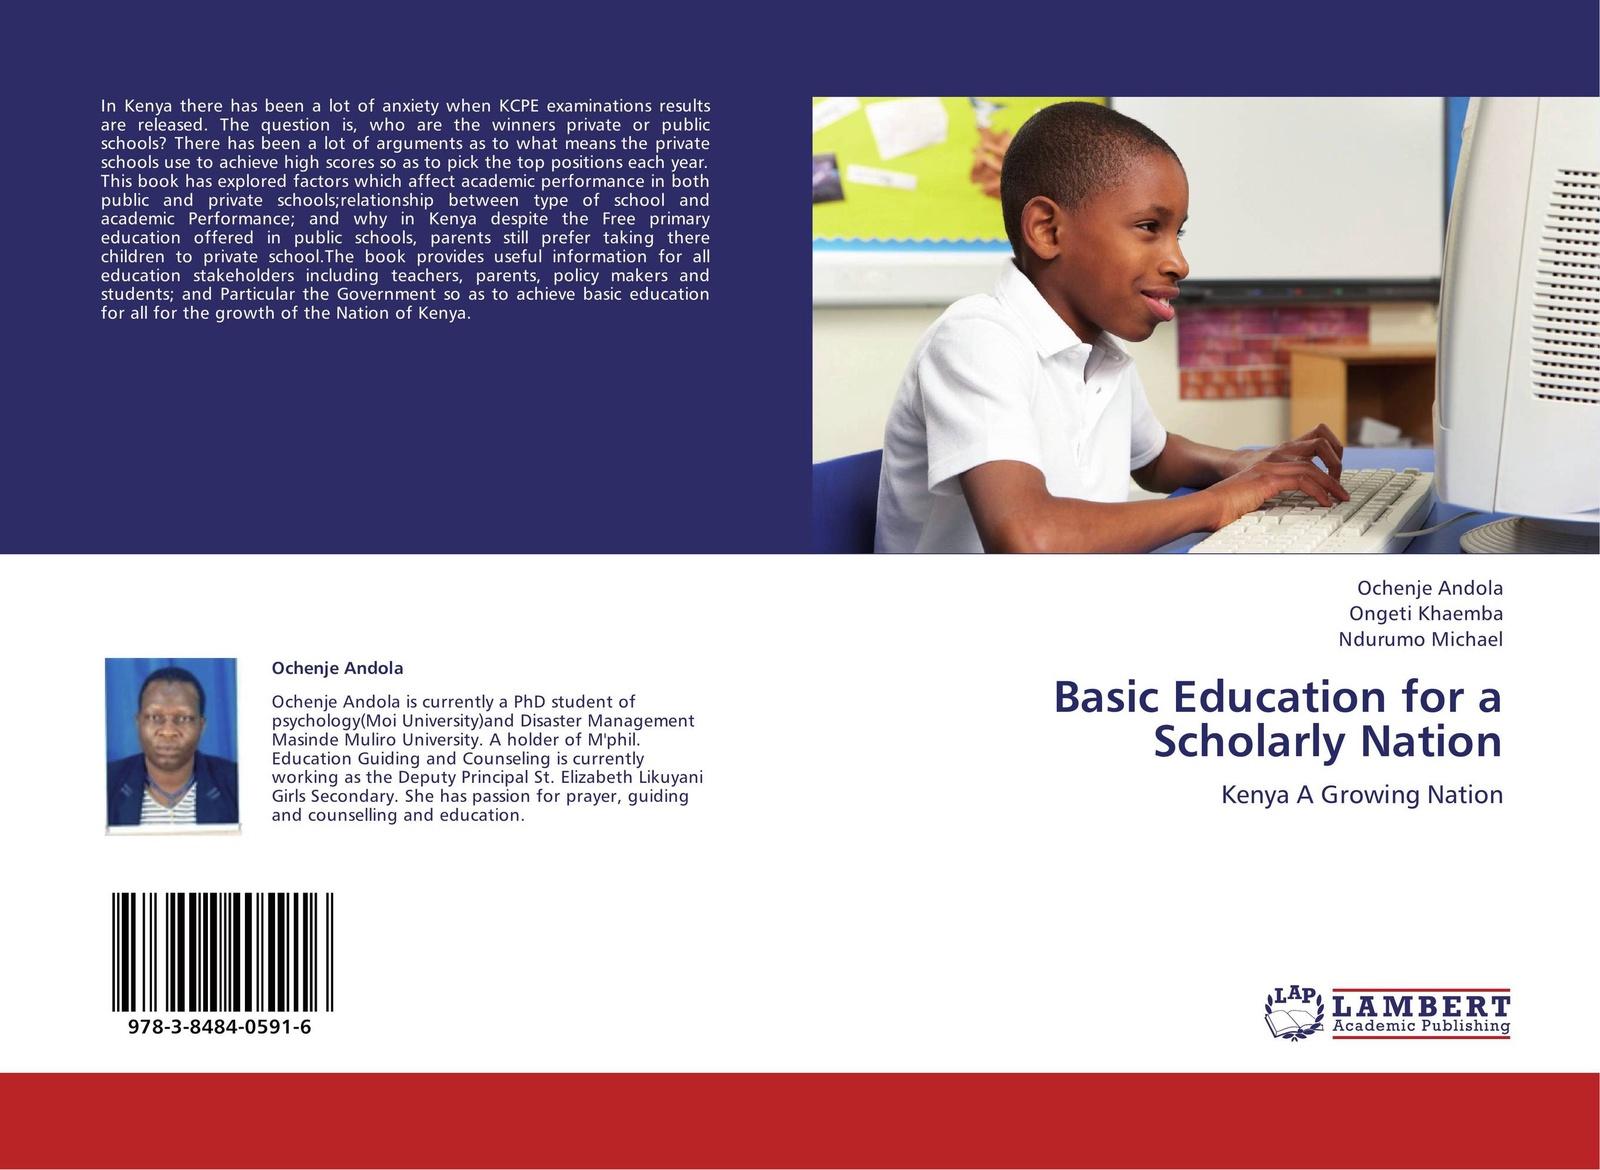 Ochenje Andola,Ongeti Khaemba and Ndurumo Michael Basic Education for a Scholarly Nation joseph lelan inclusive education in kenya